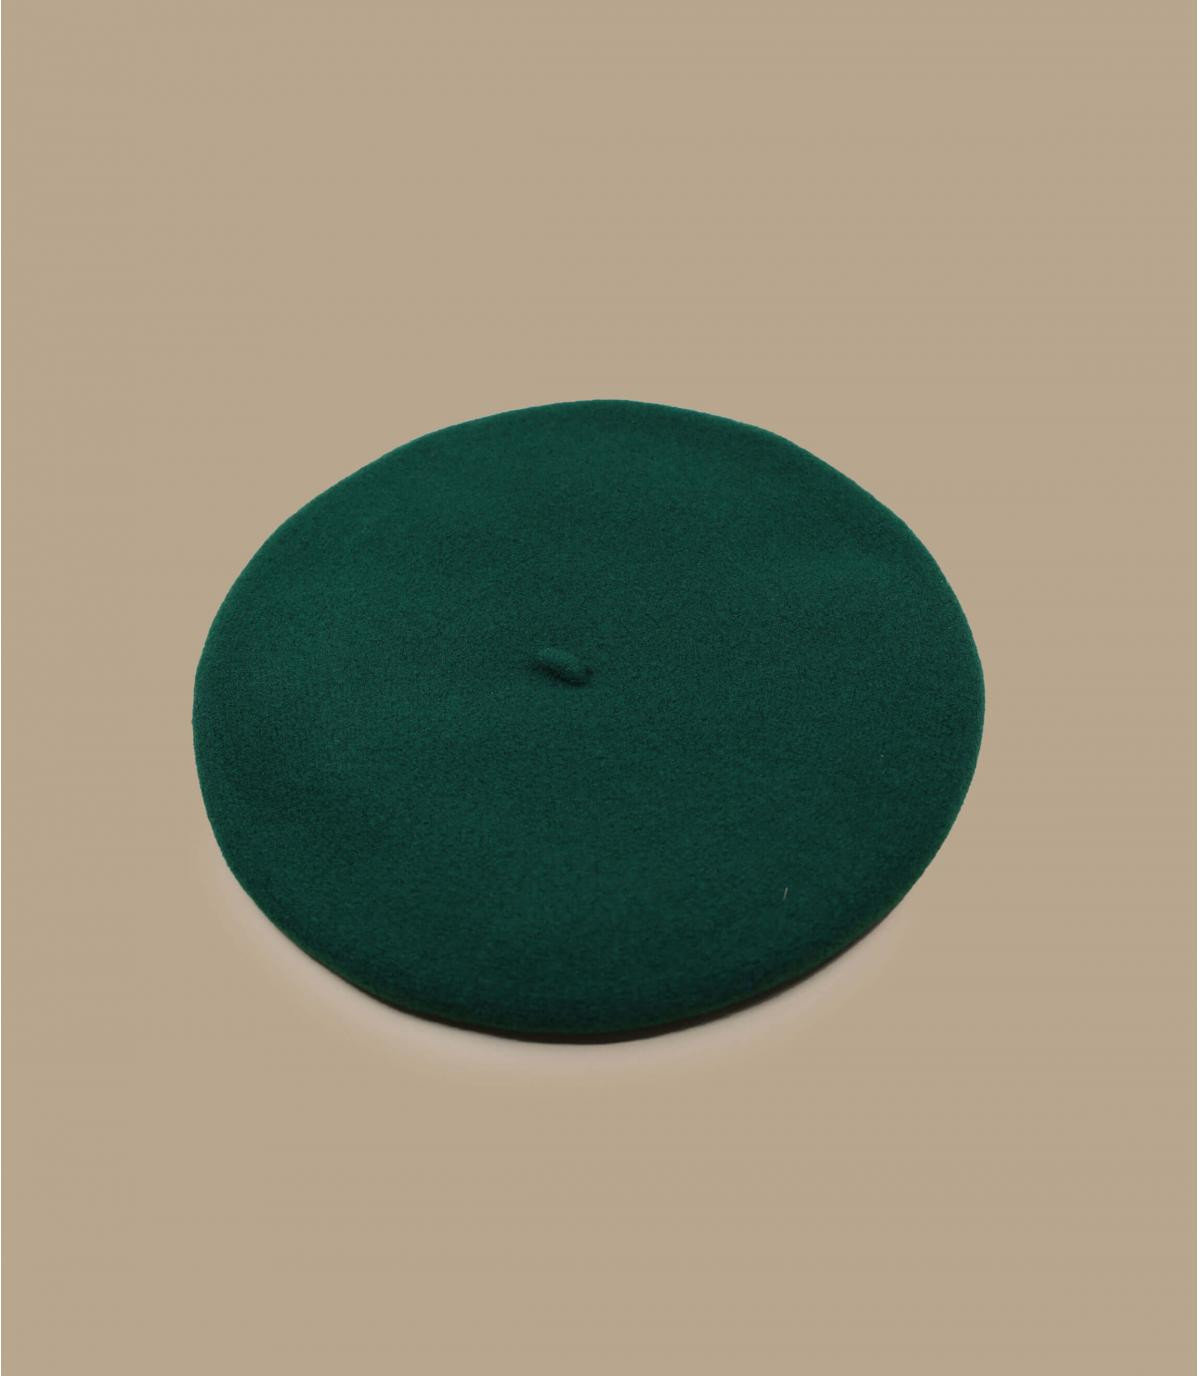 boina verde lana merino